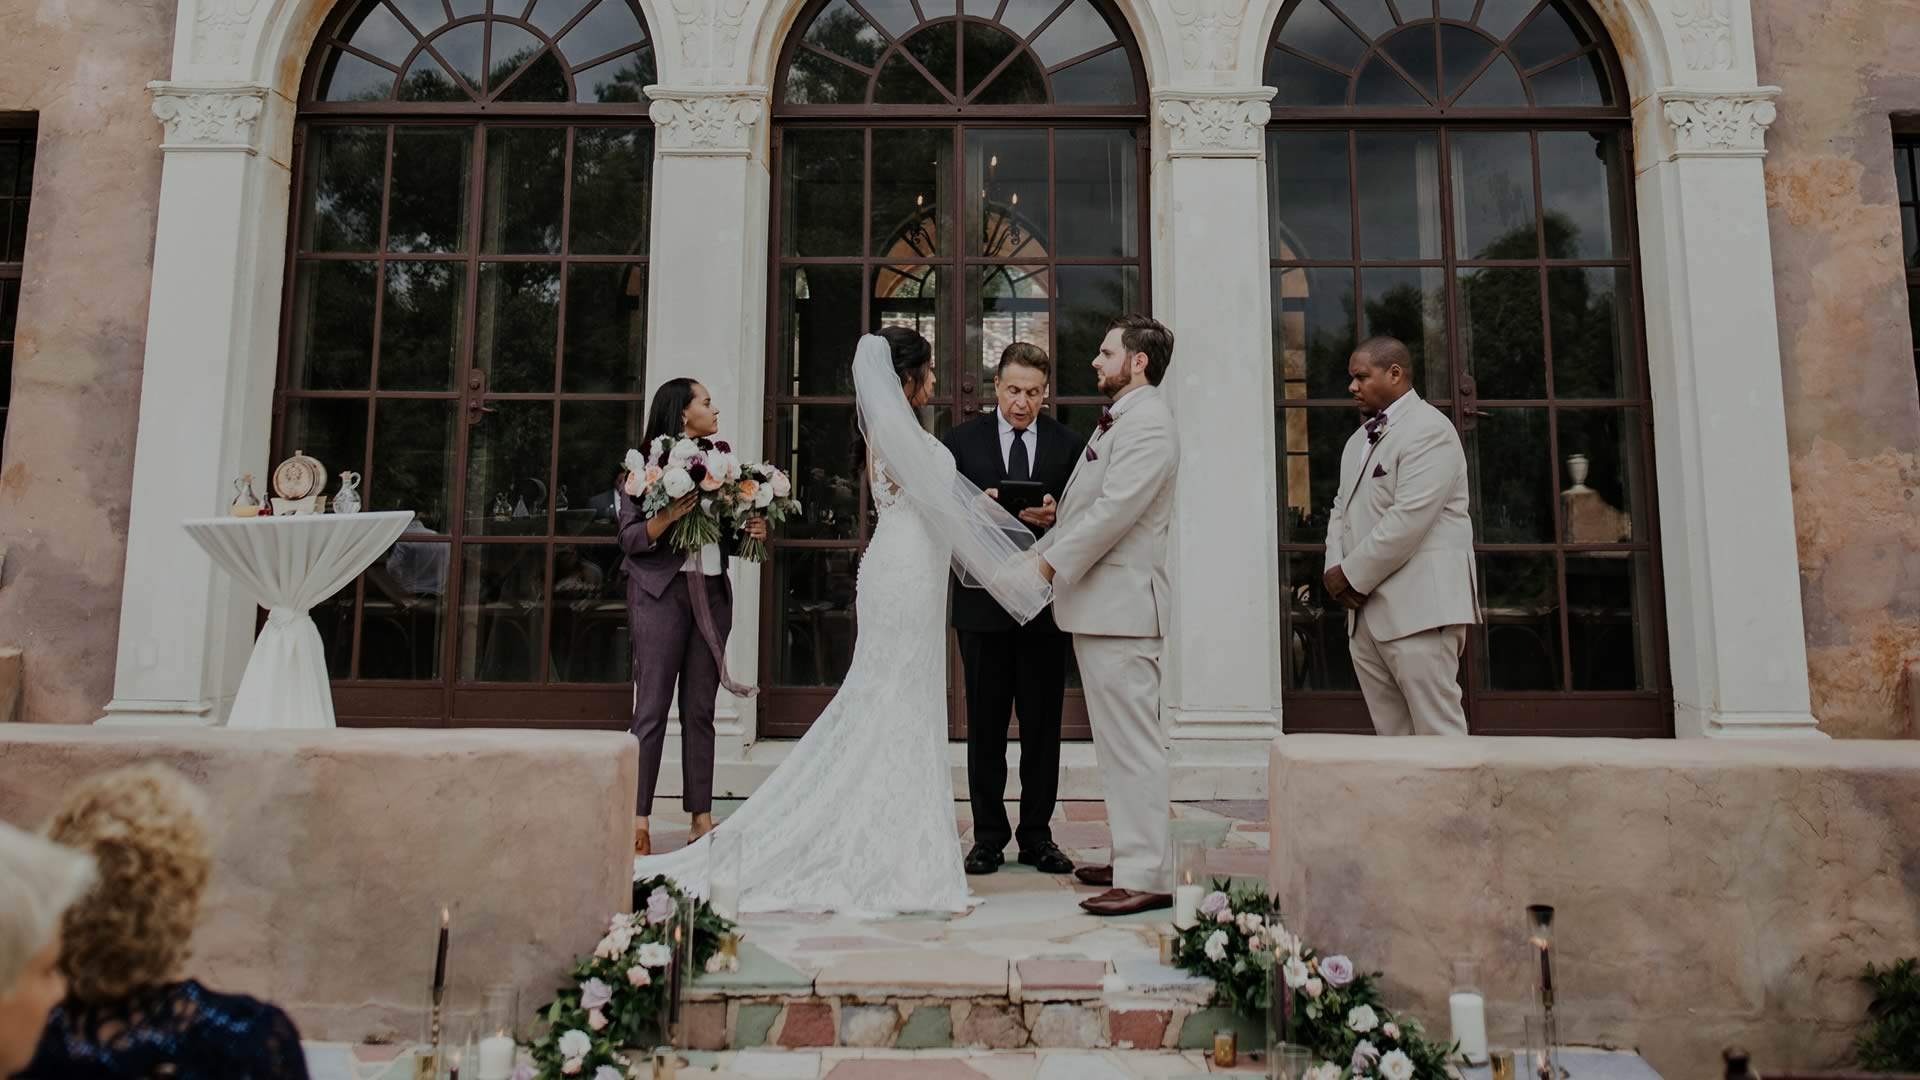 The Howey Mansion - Sensational Ceremonies